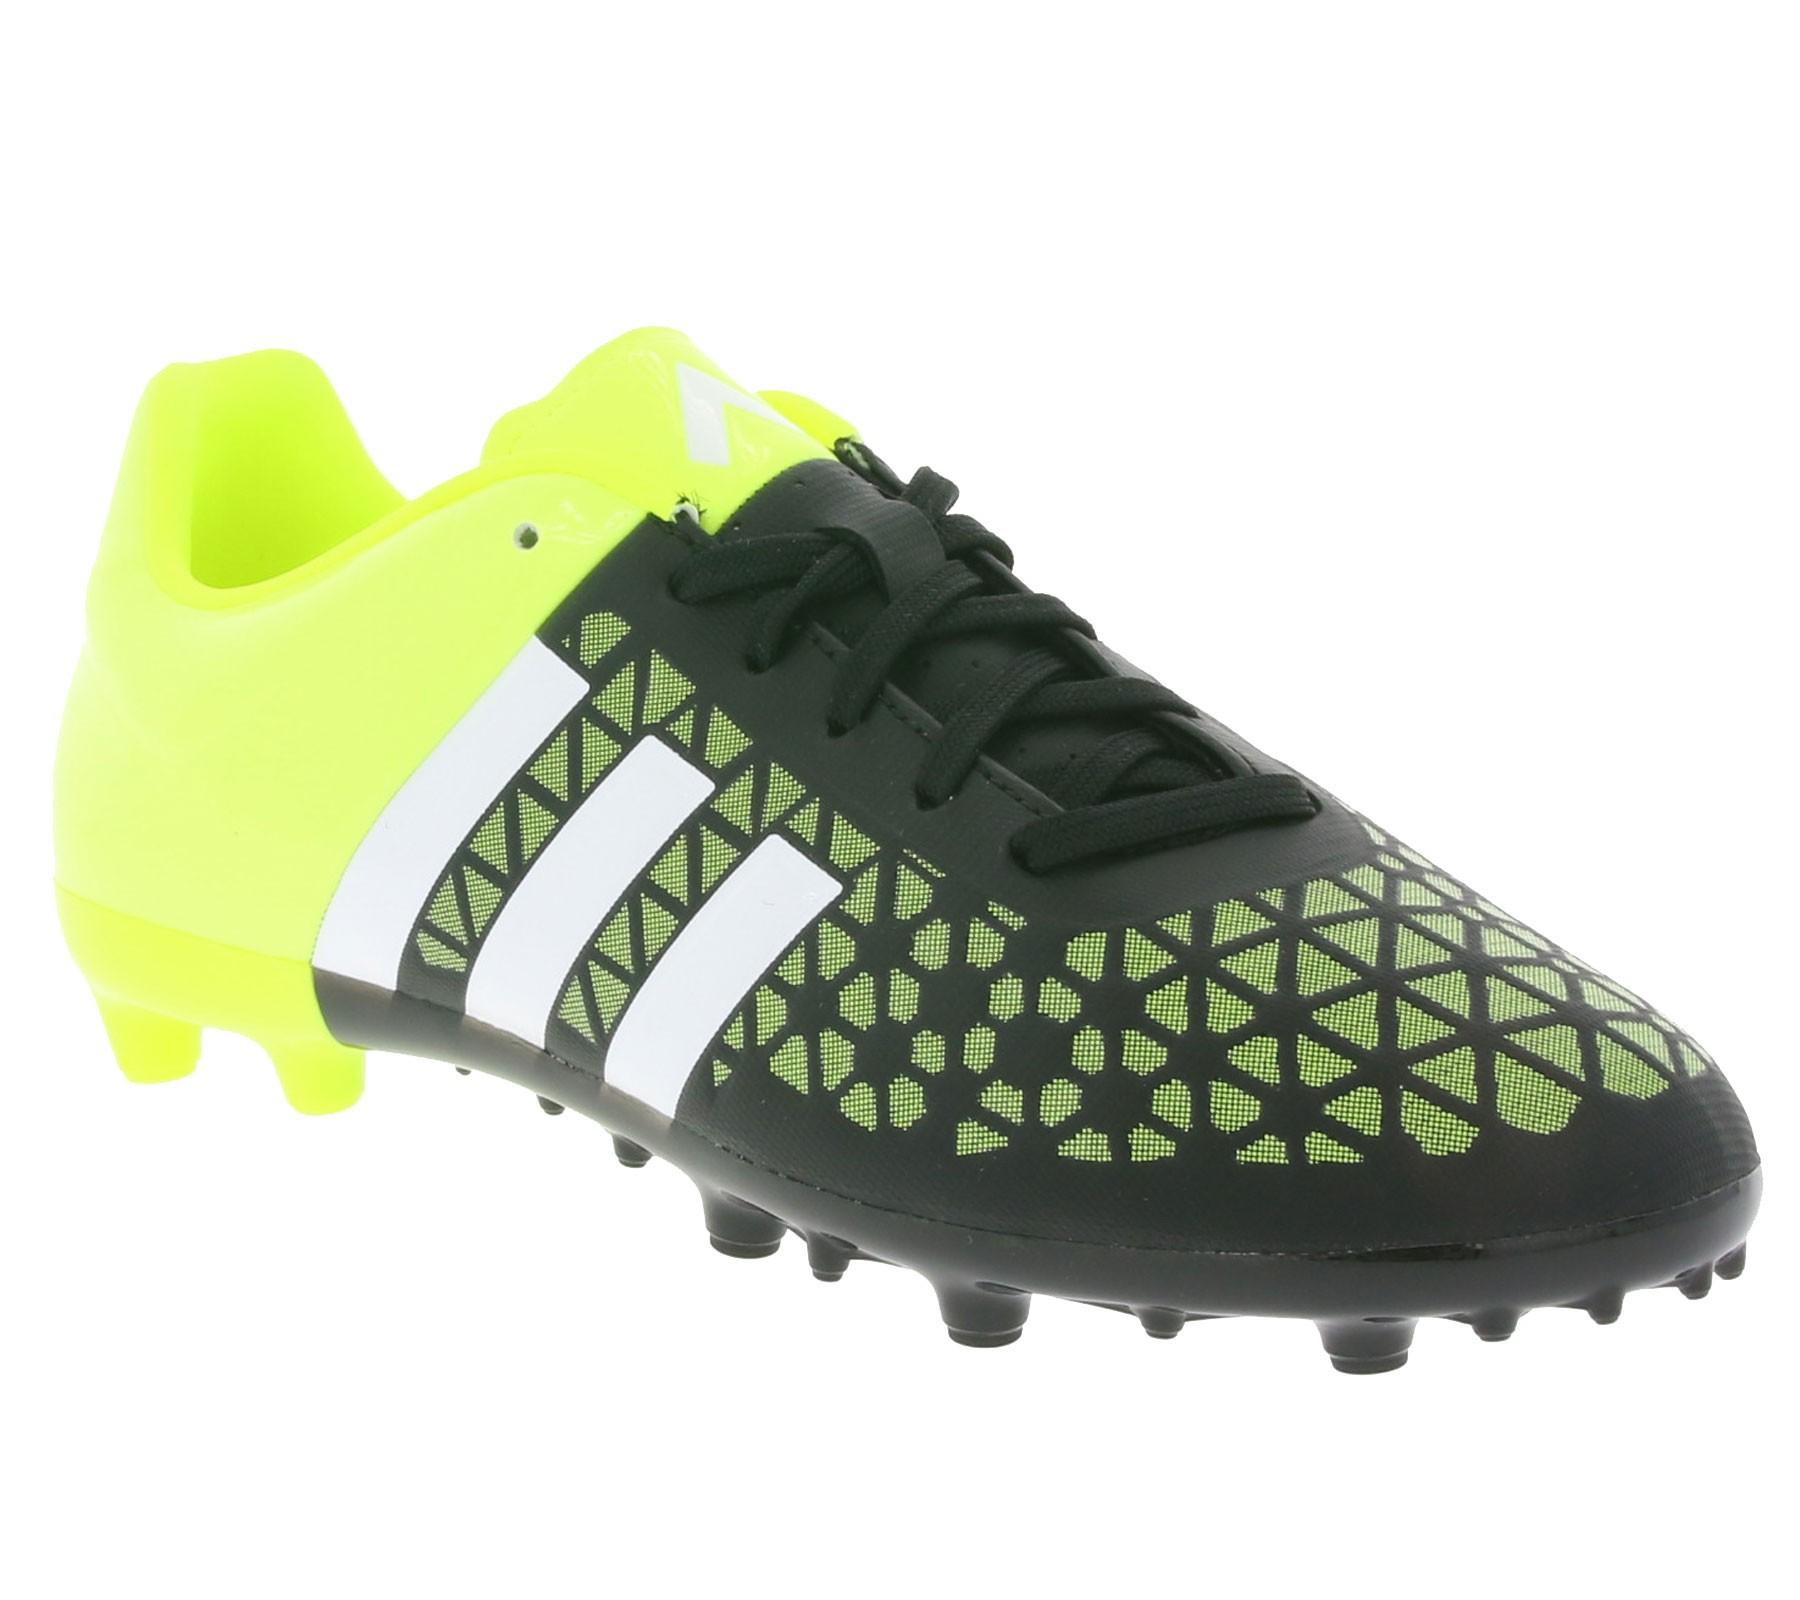 adidas ACE 15.3 FG/AG J Kinder Fußballschuhe --> 9,99 € inkl. Versand statt 22 €